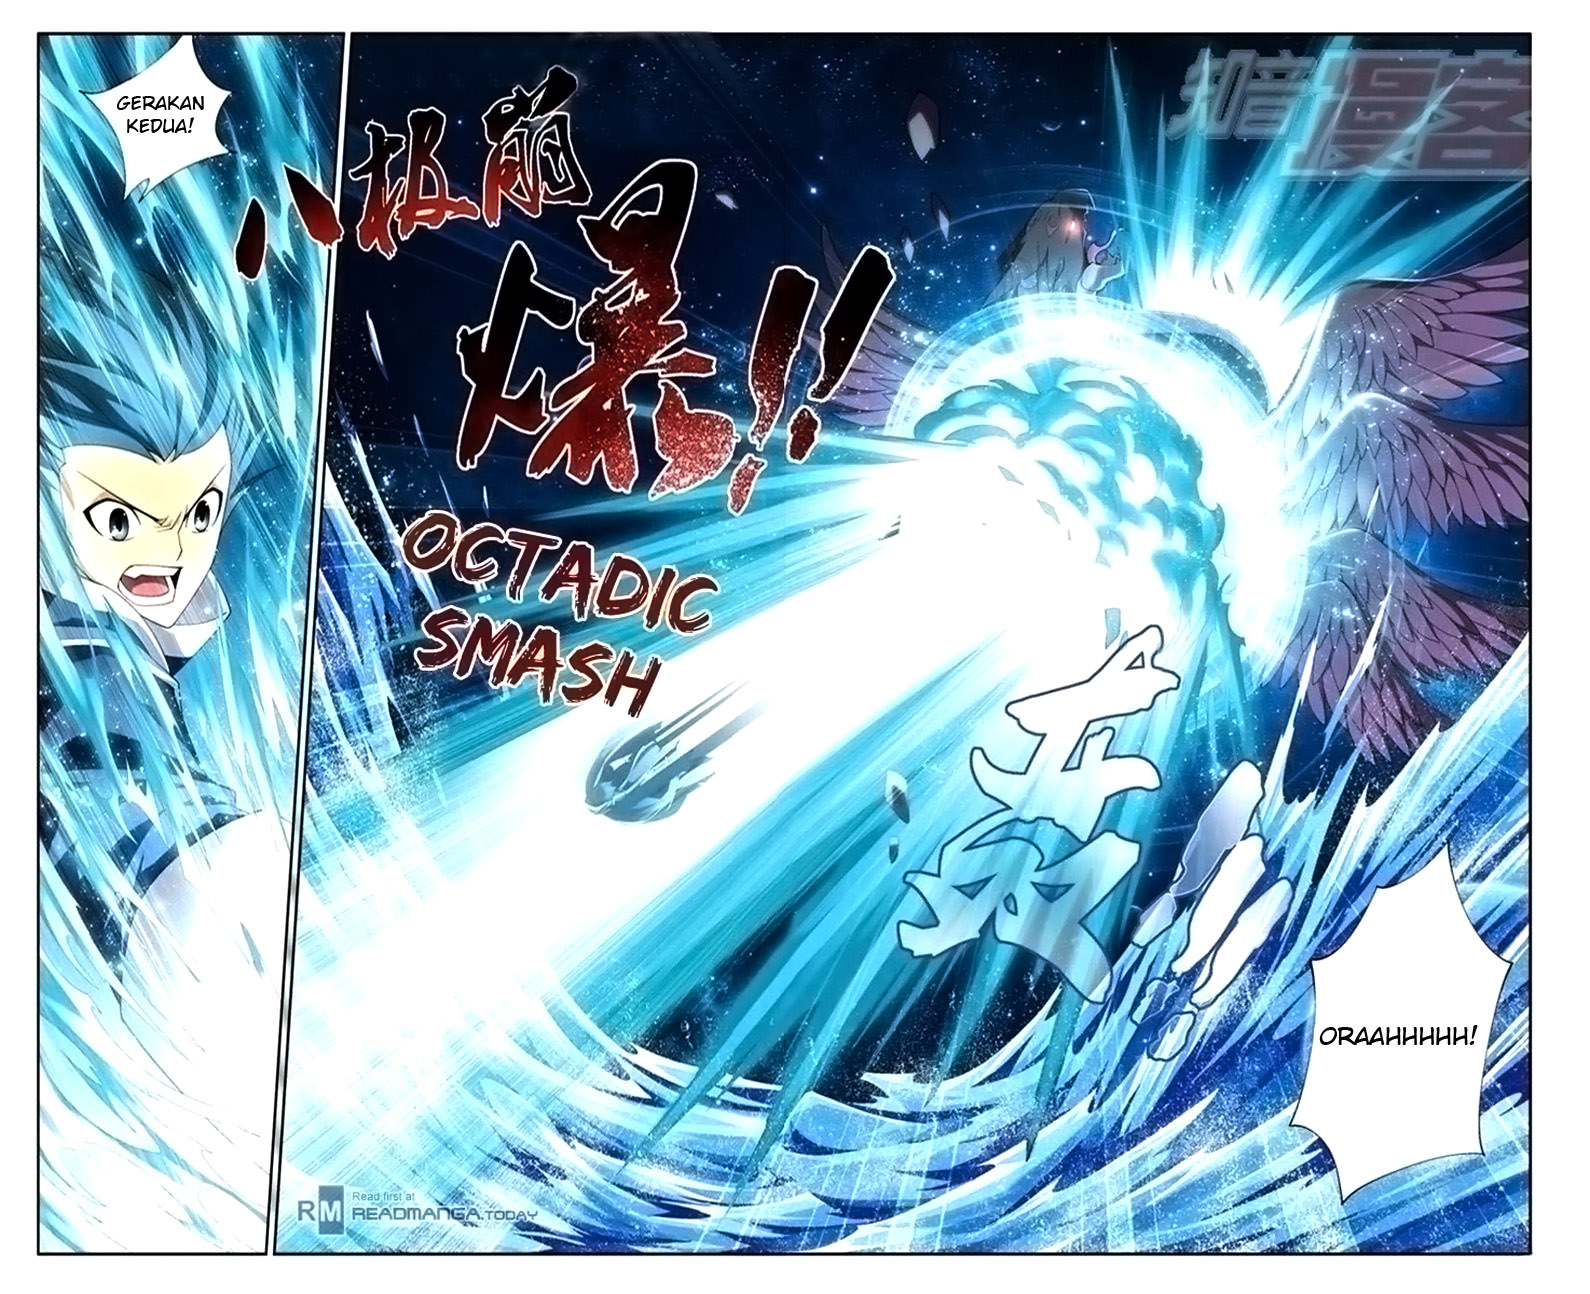 Dilarang COPAS - situs resmi www.mangacanblog.com - Komik battle through heaven 057 - chapter 57 58 Indonesia battle through heaven 057 - chapter 57 Terbaru 4|Baca Manga Komik Indonesia|Mangacan